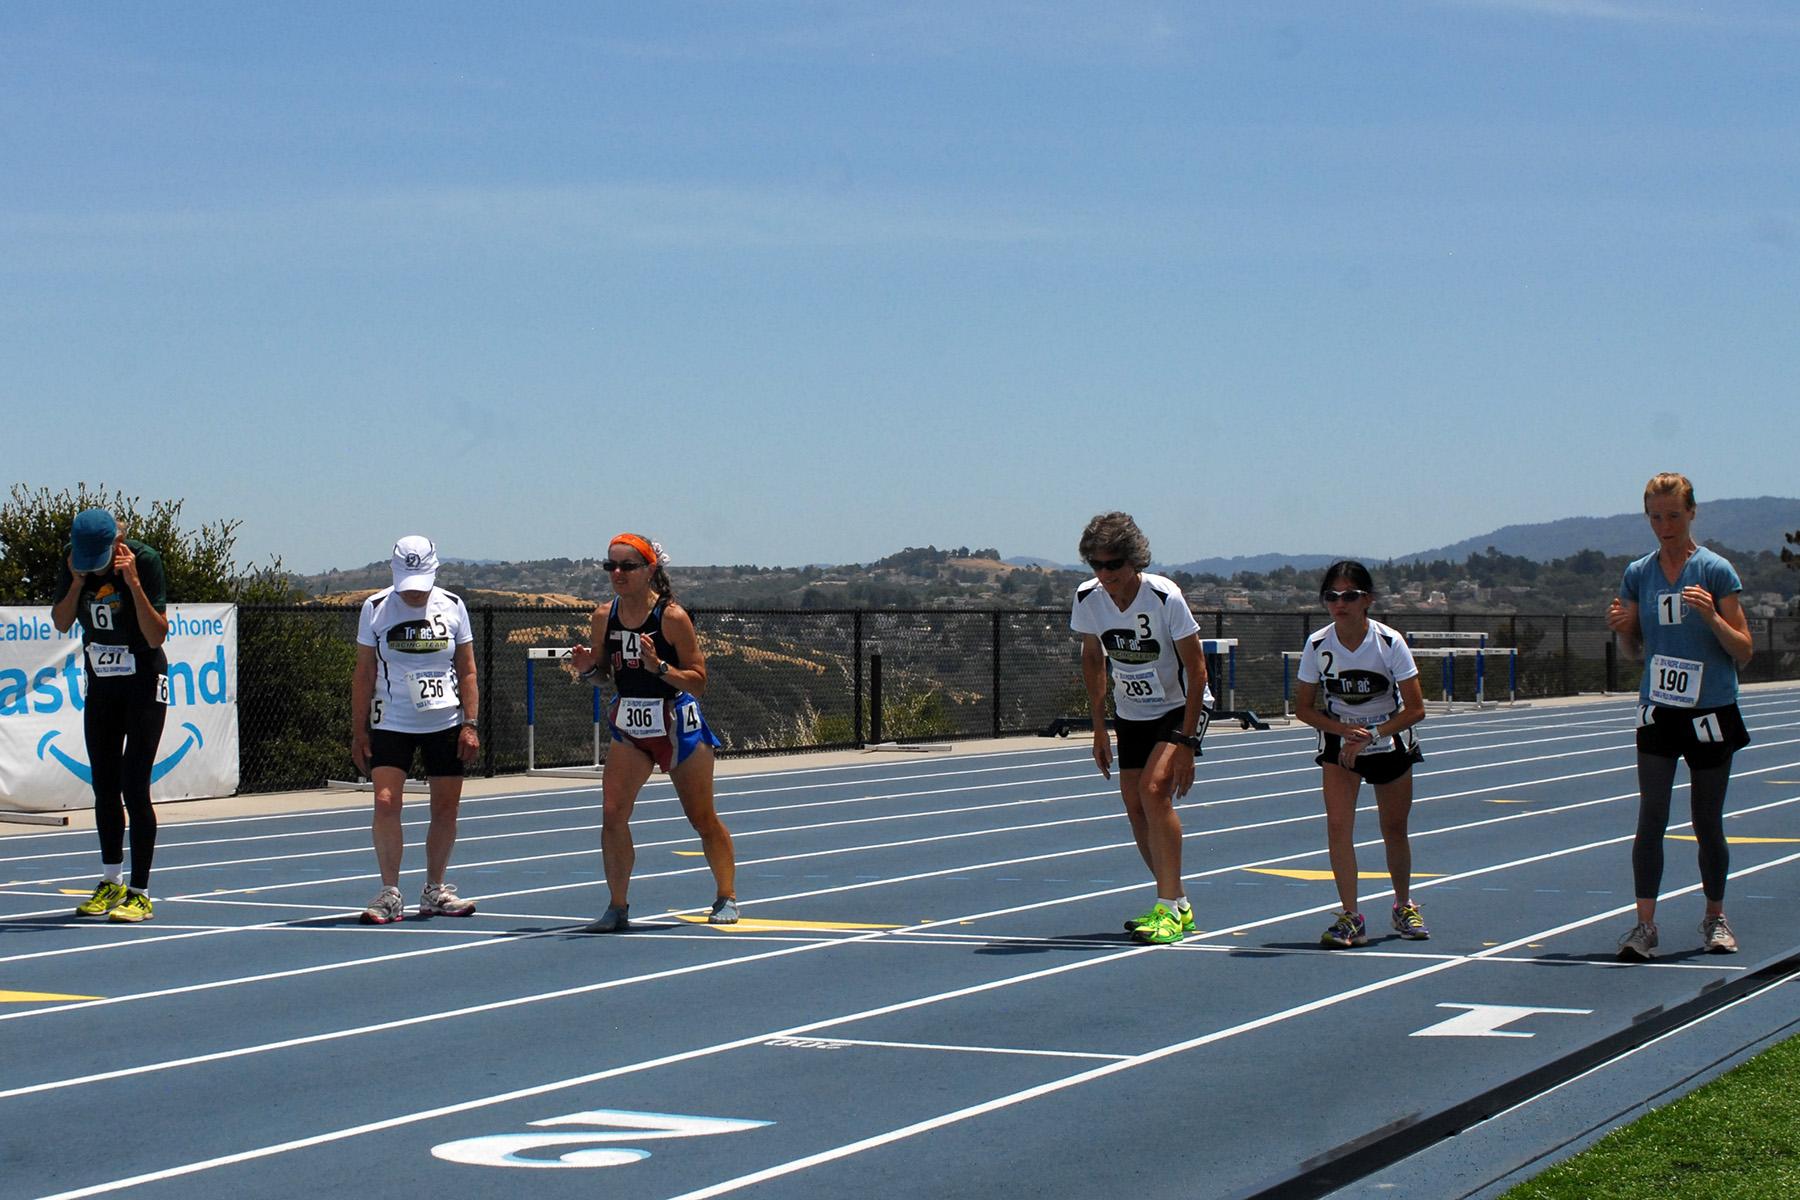 PAUSATF_Masters_Championships_2014_5K_Womens-Start